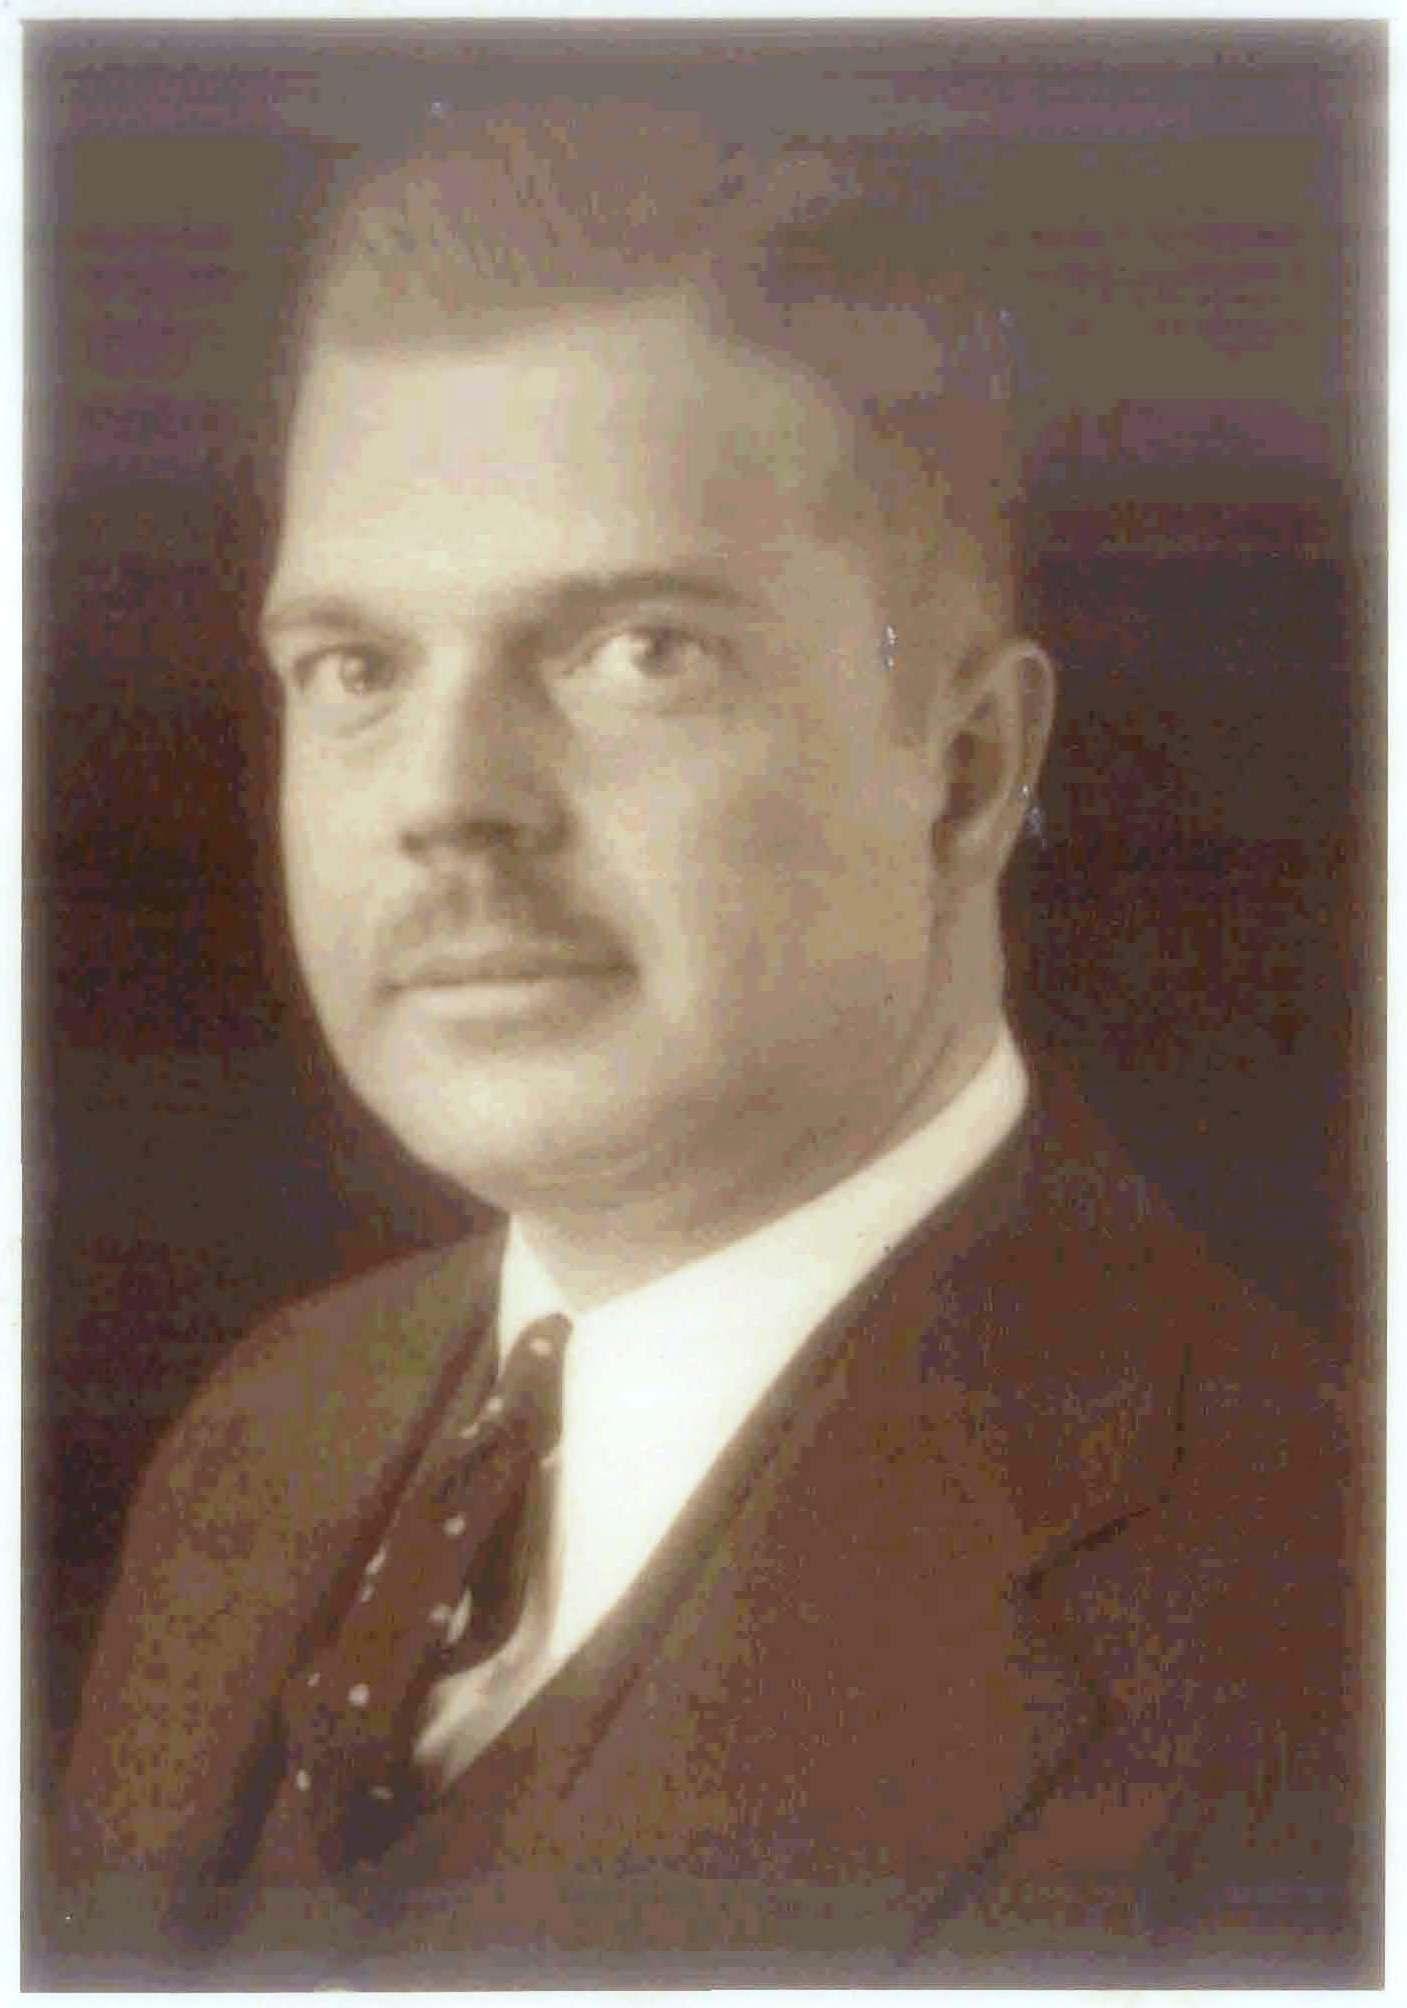 Robert Barnes Bob Bryant, II